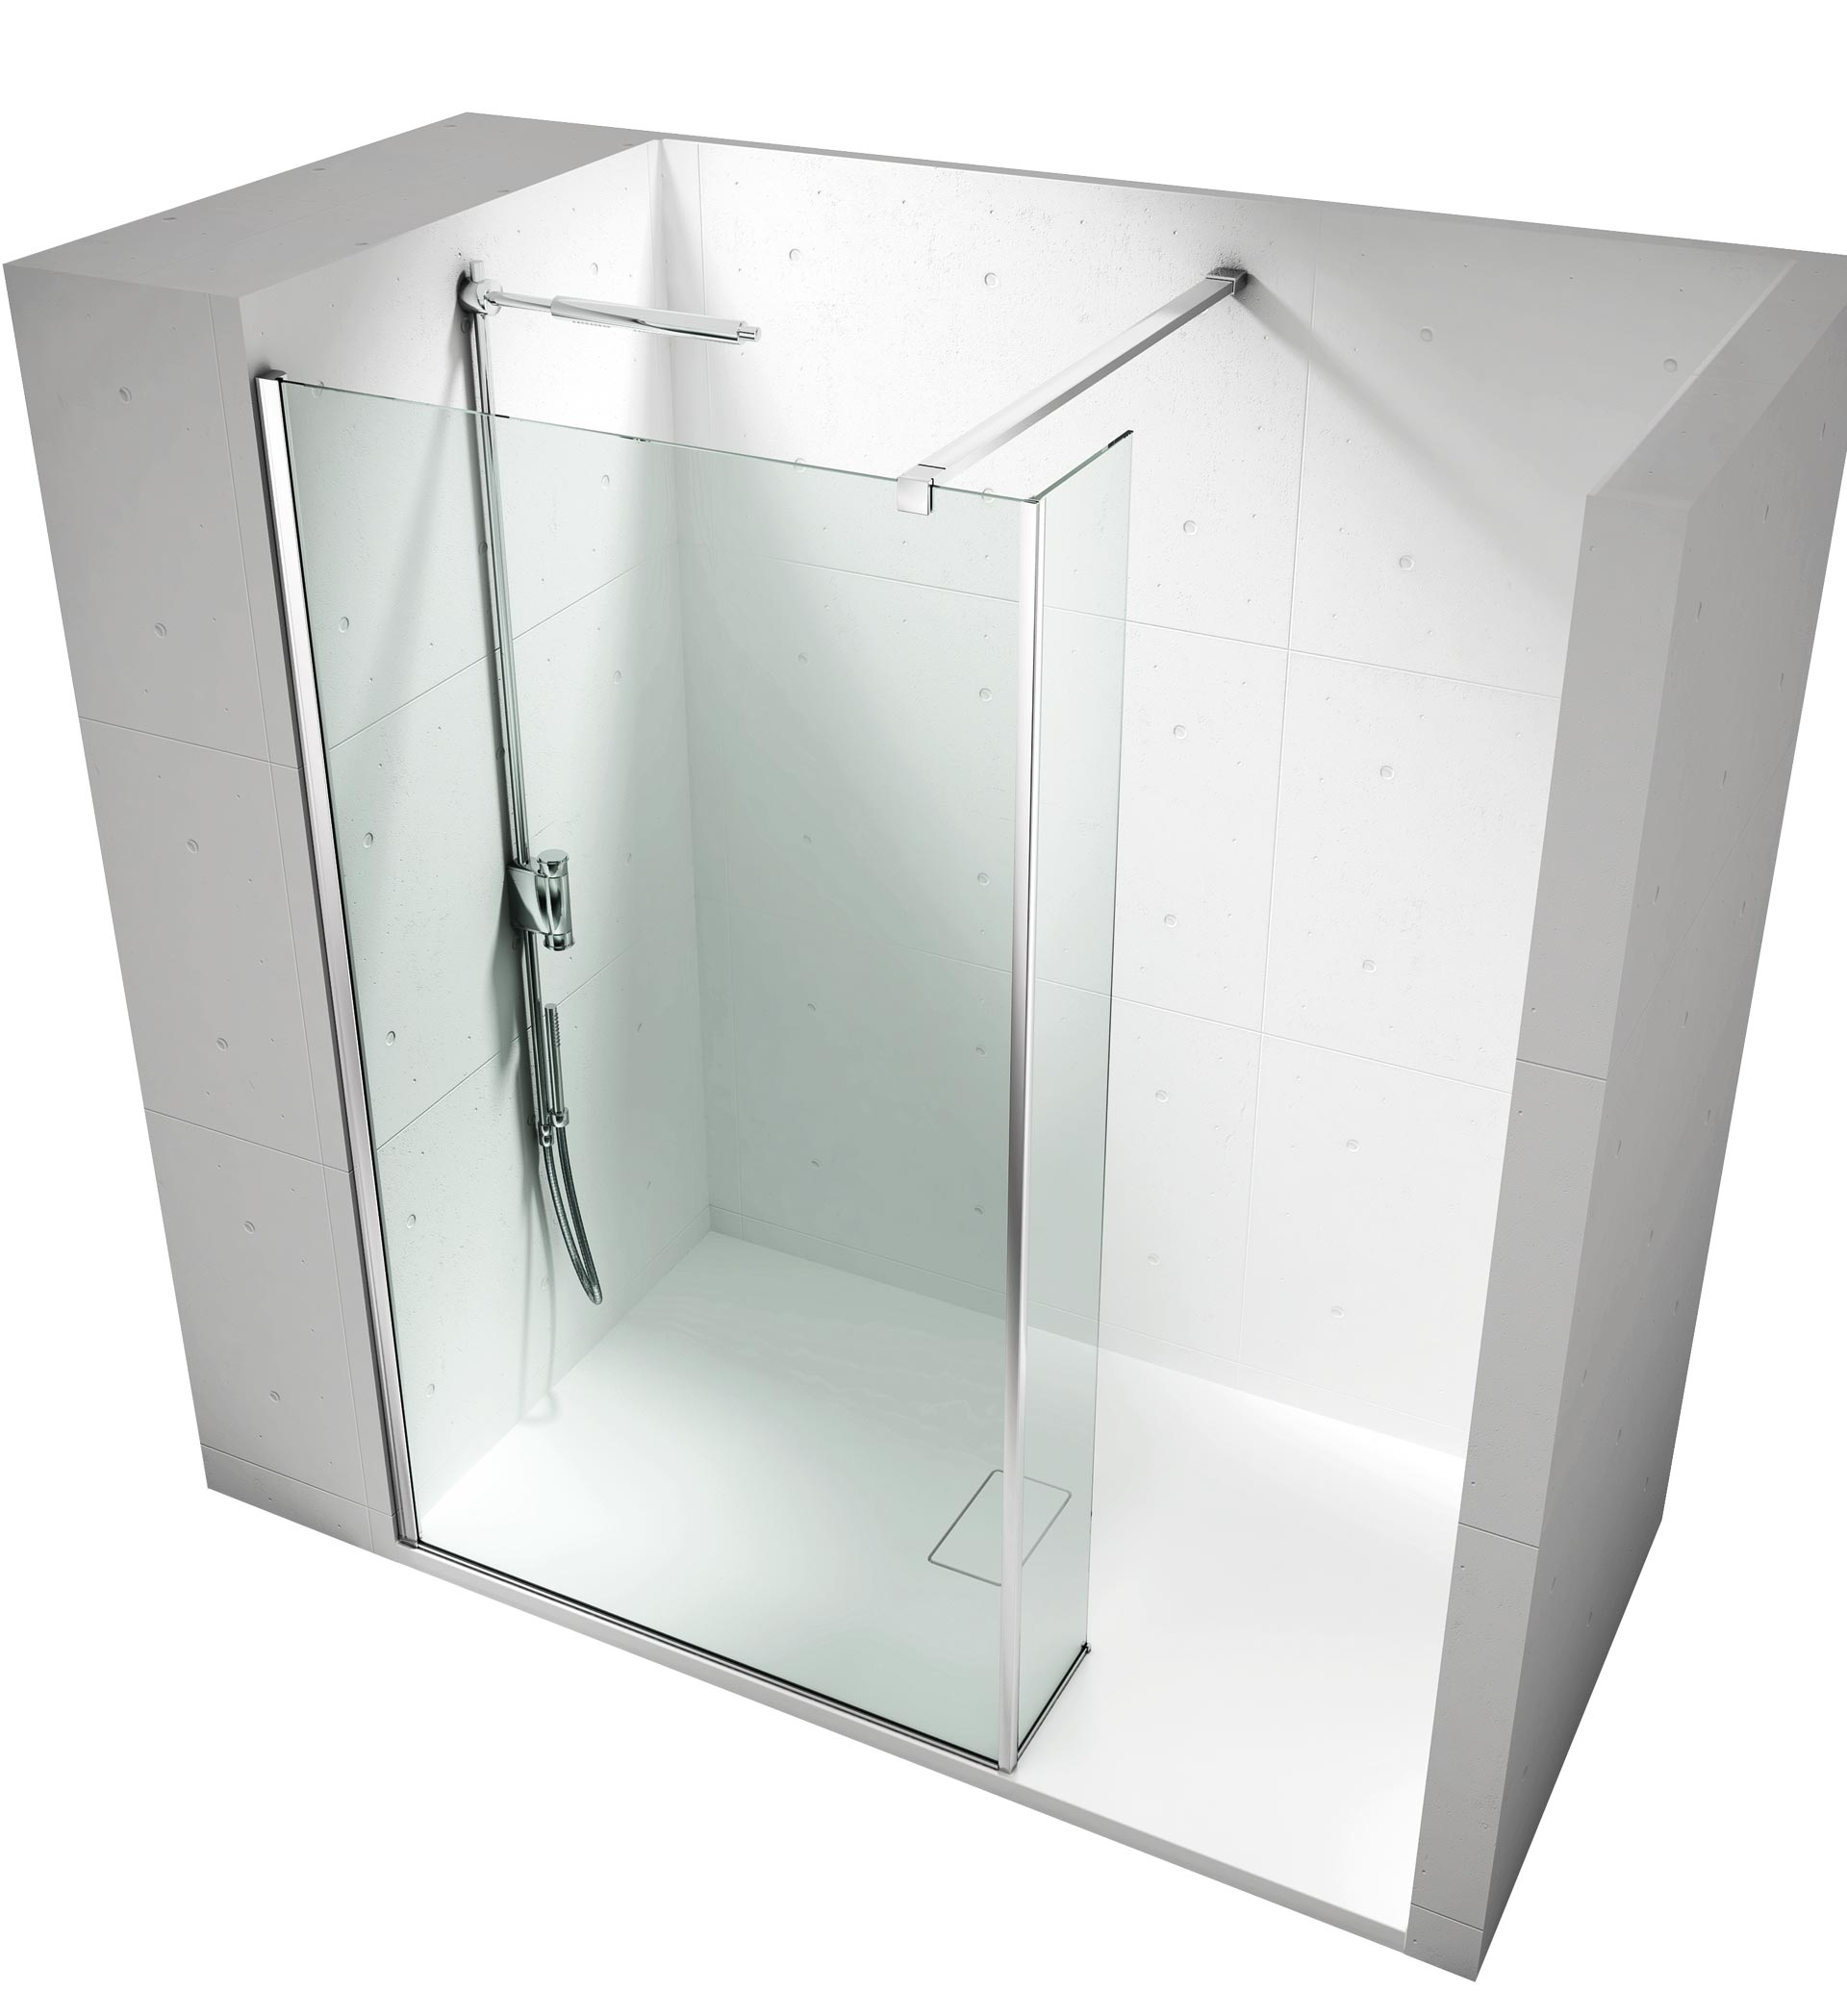 Box doccia vismara vetro vasta esposizione da euroedil - Pareti doccia su misura ...